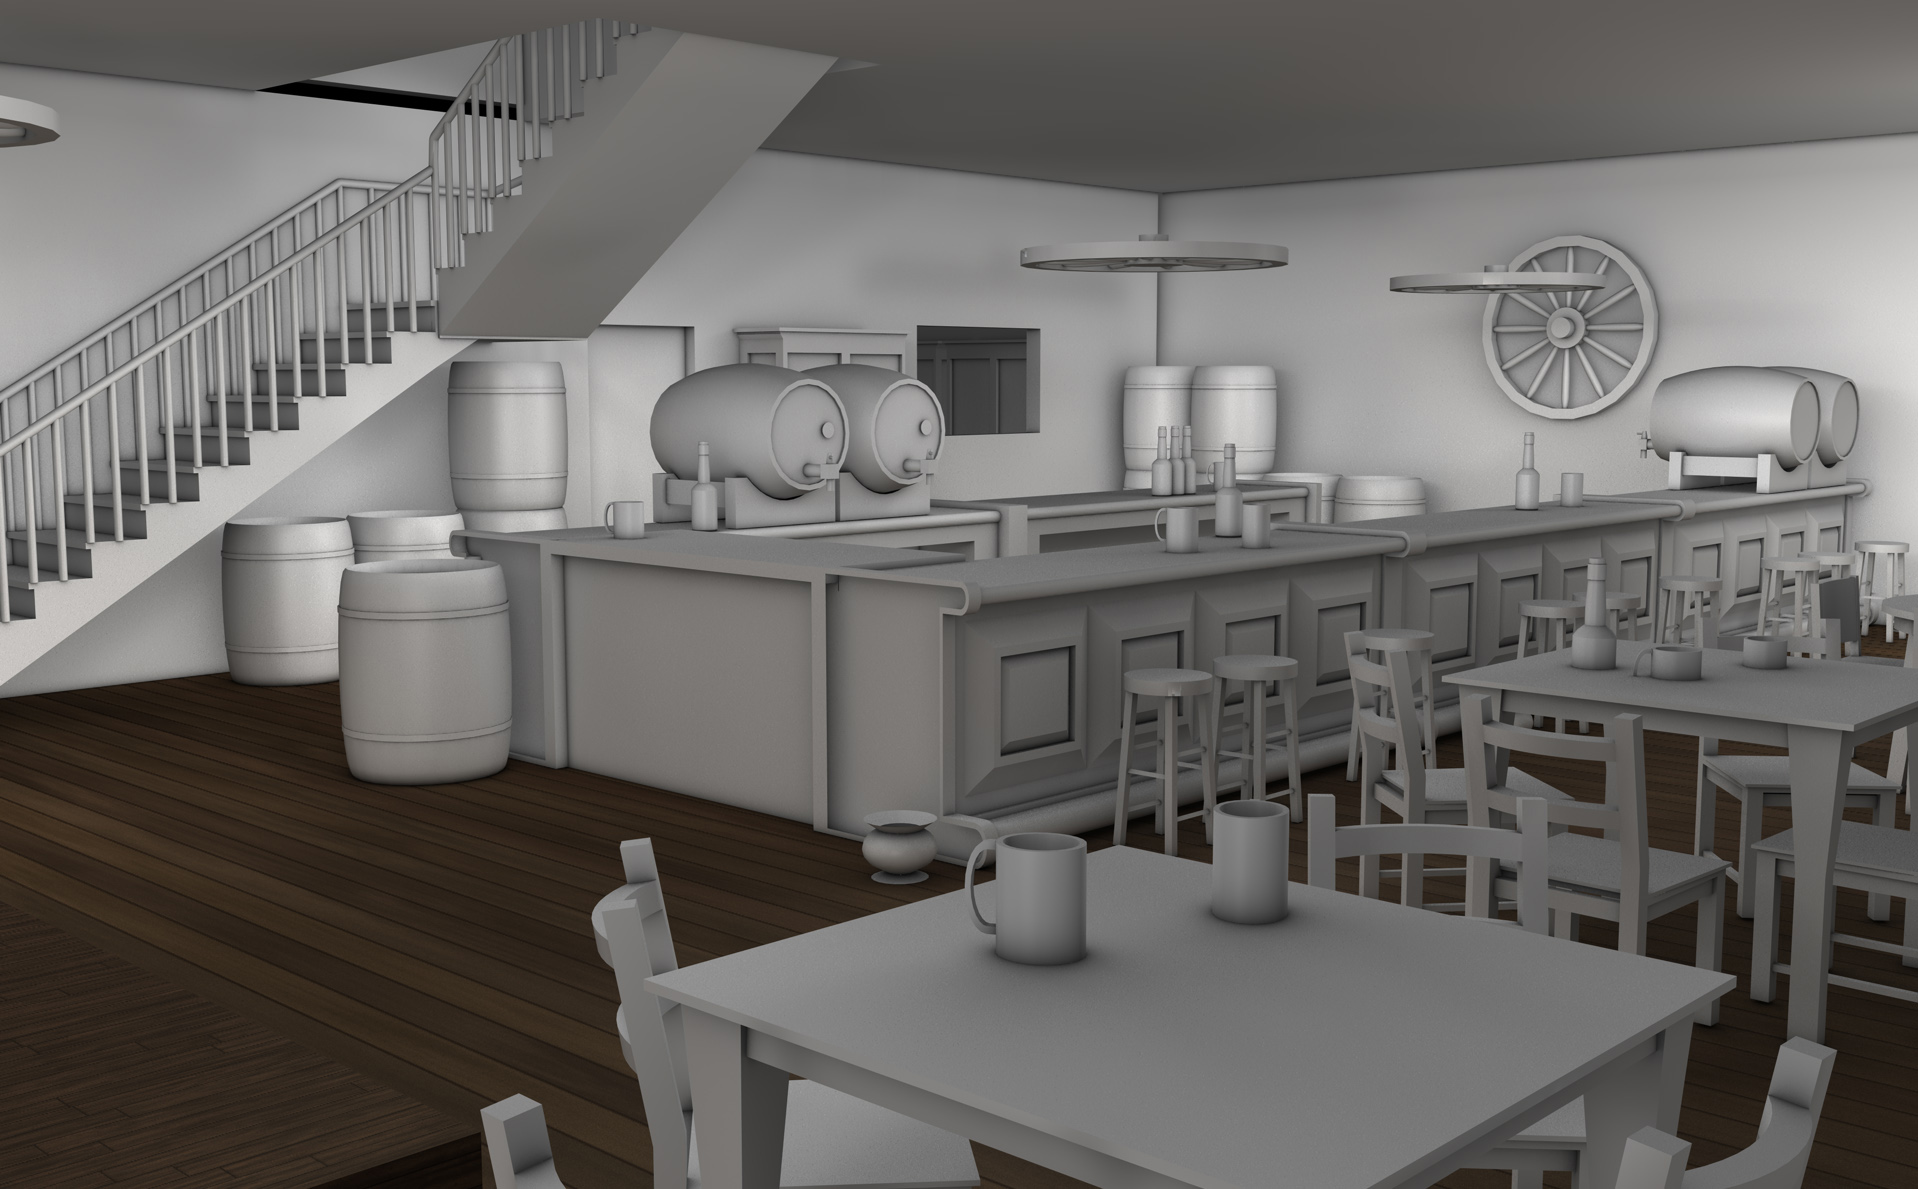 3Dview02 copy.jpg